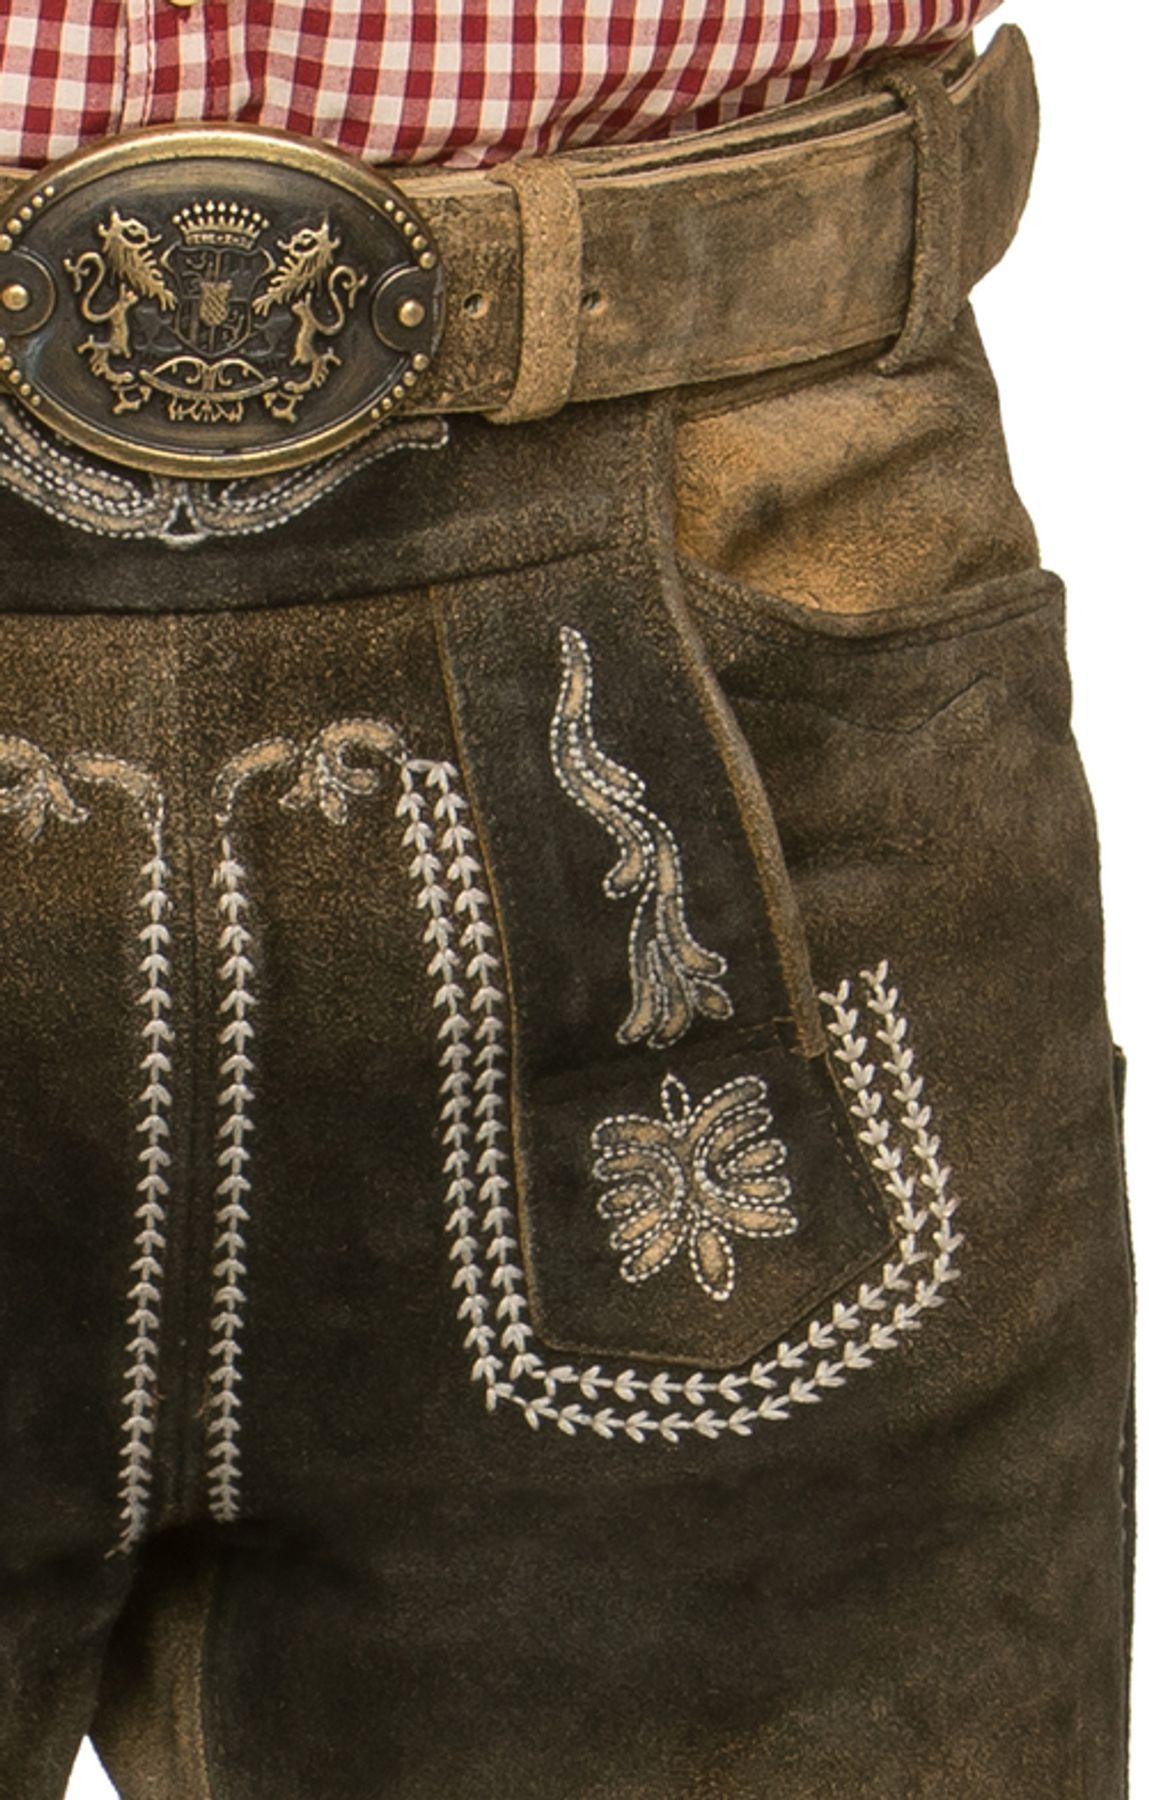 Stockerpoint - Herren Trachten Lederhose mit Gürtel, in uroid gespeckt, Sebastian – Bild 4